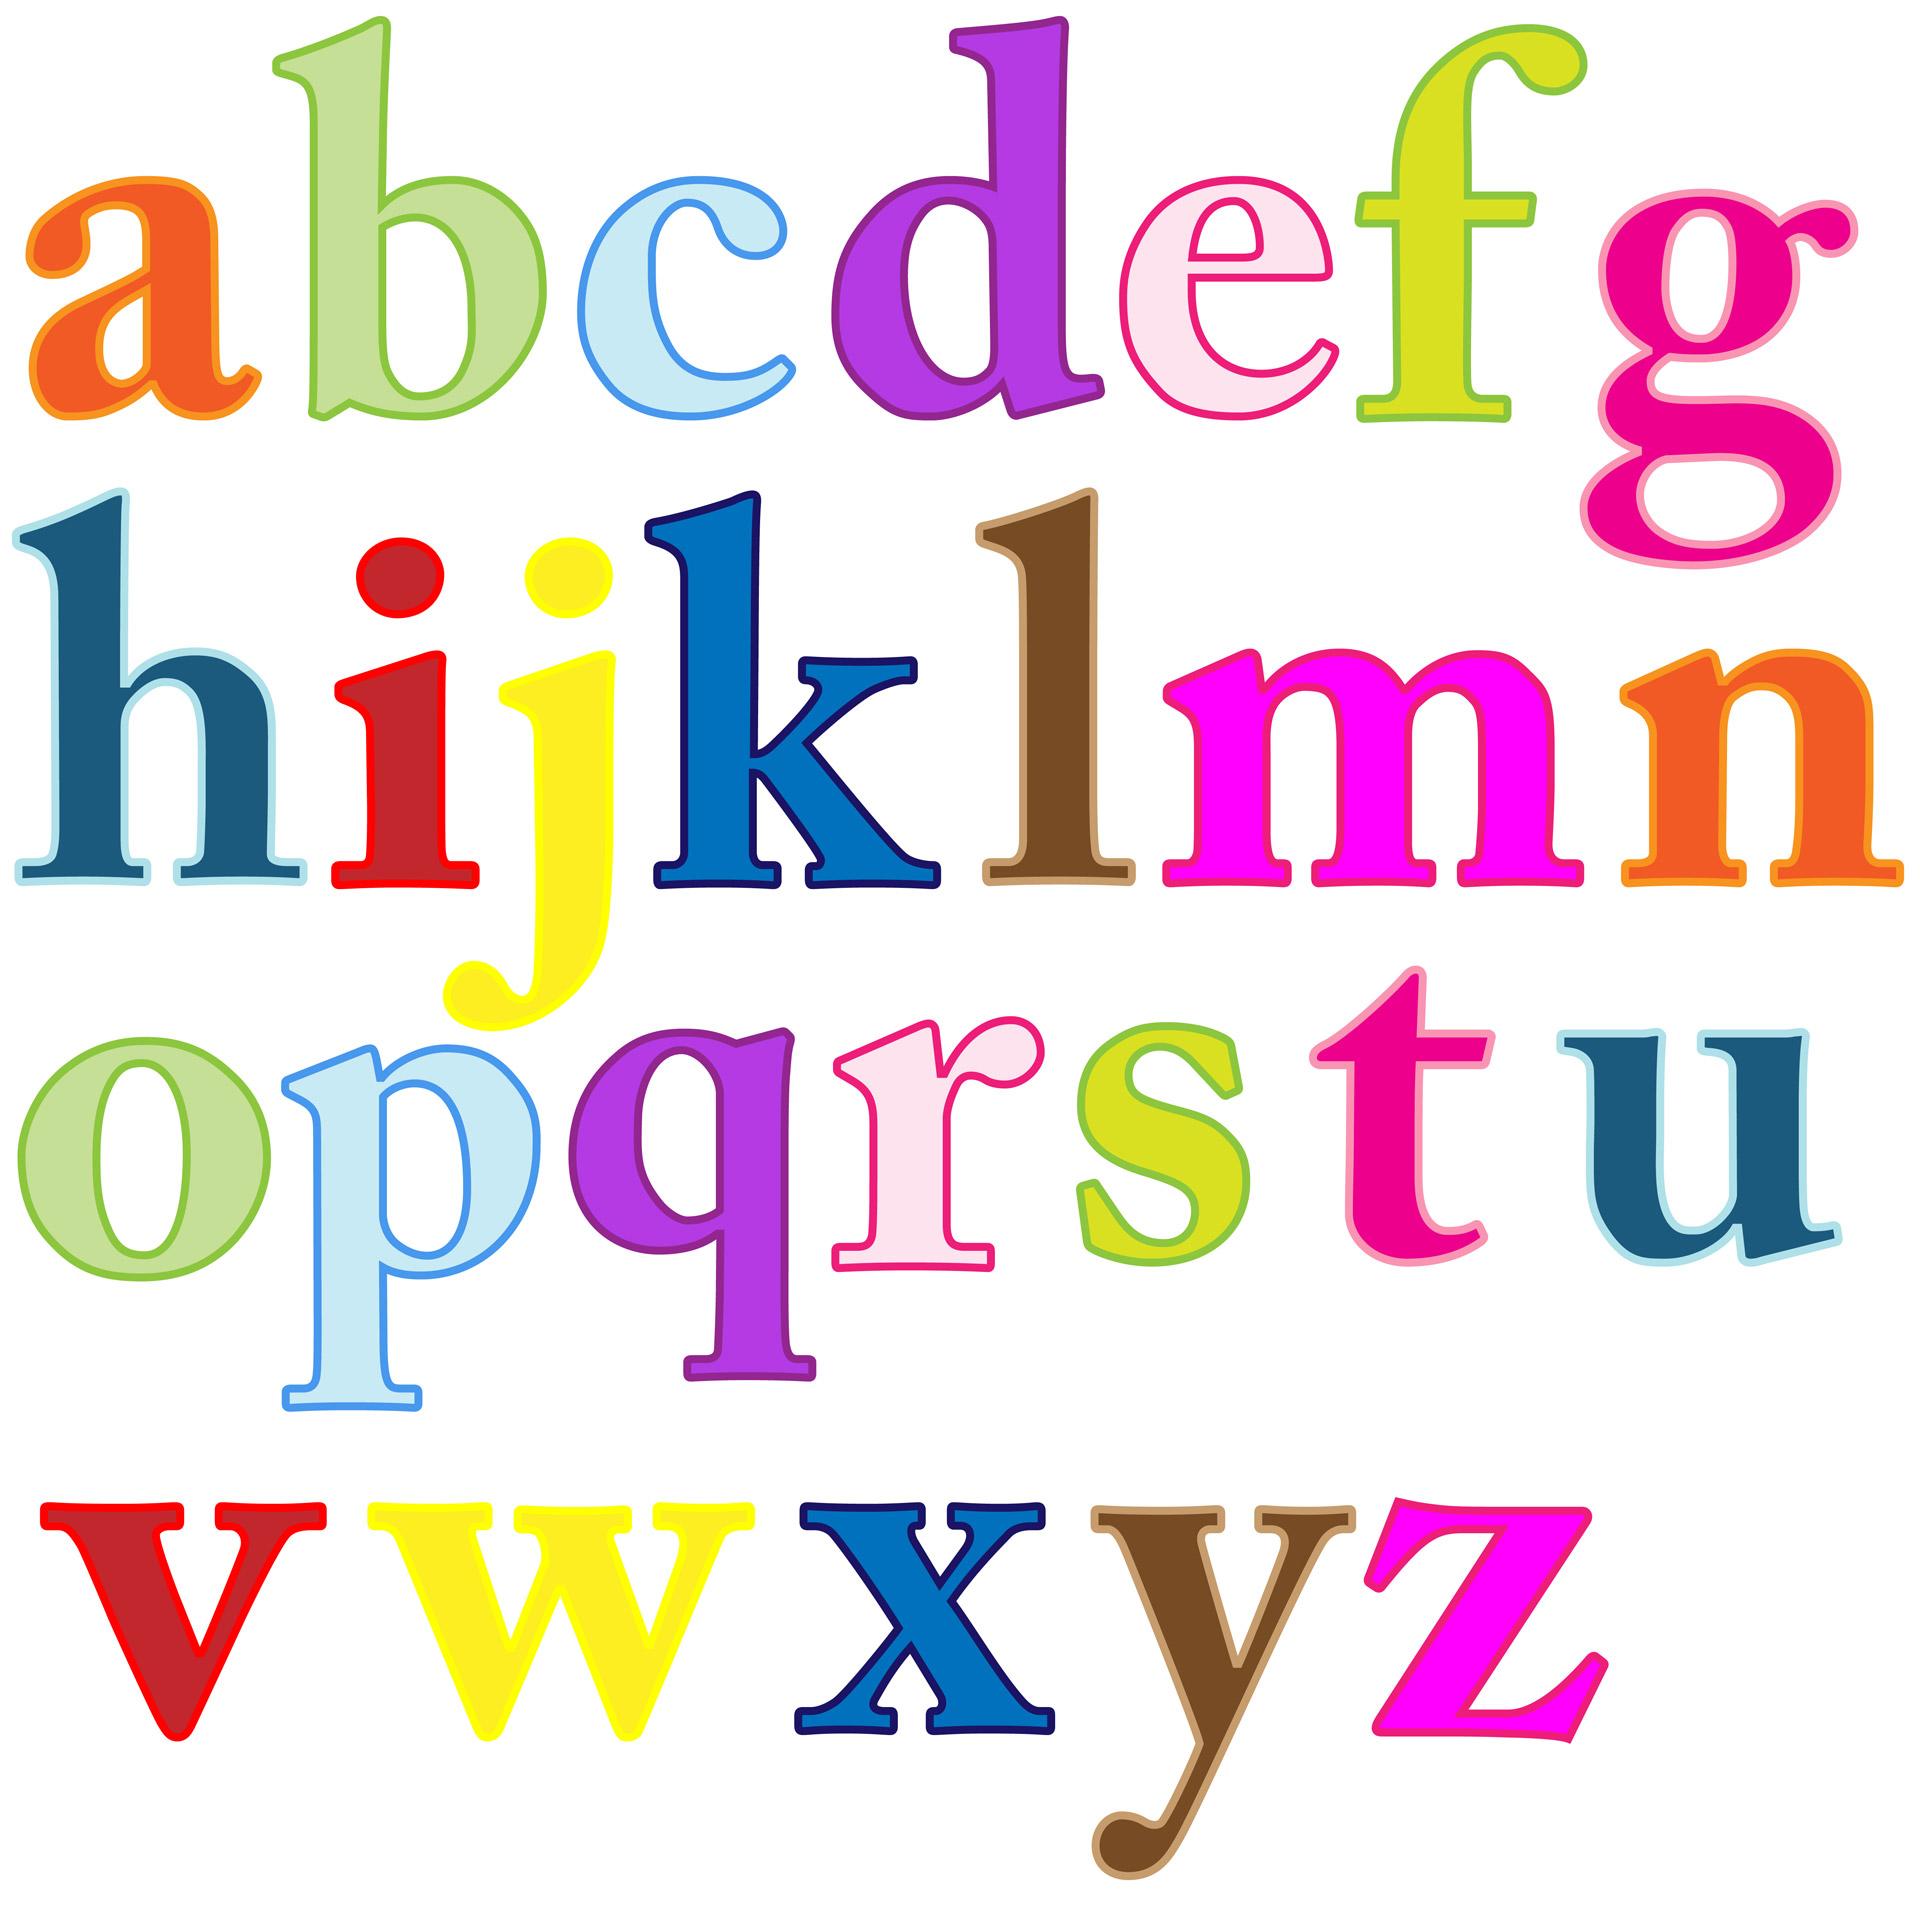 1920x1920 Alphabet Letters Clip Art Free Stock Photo